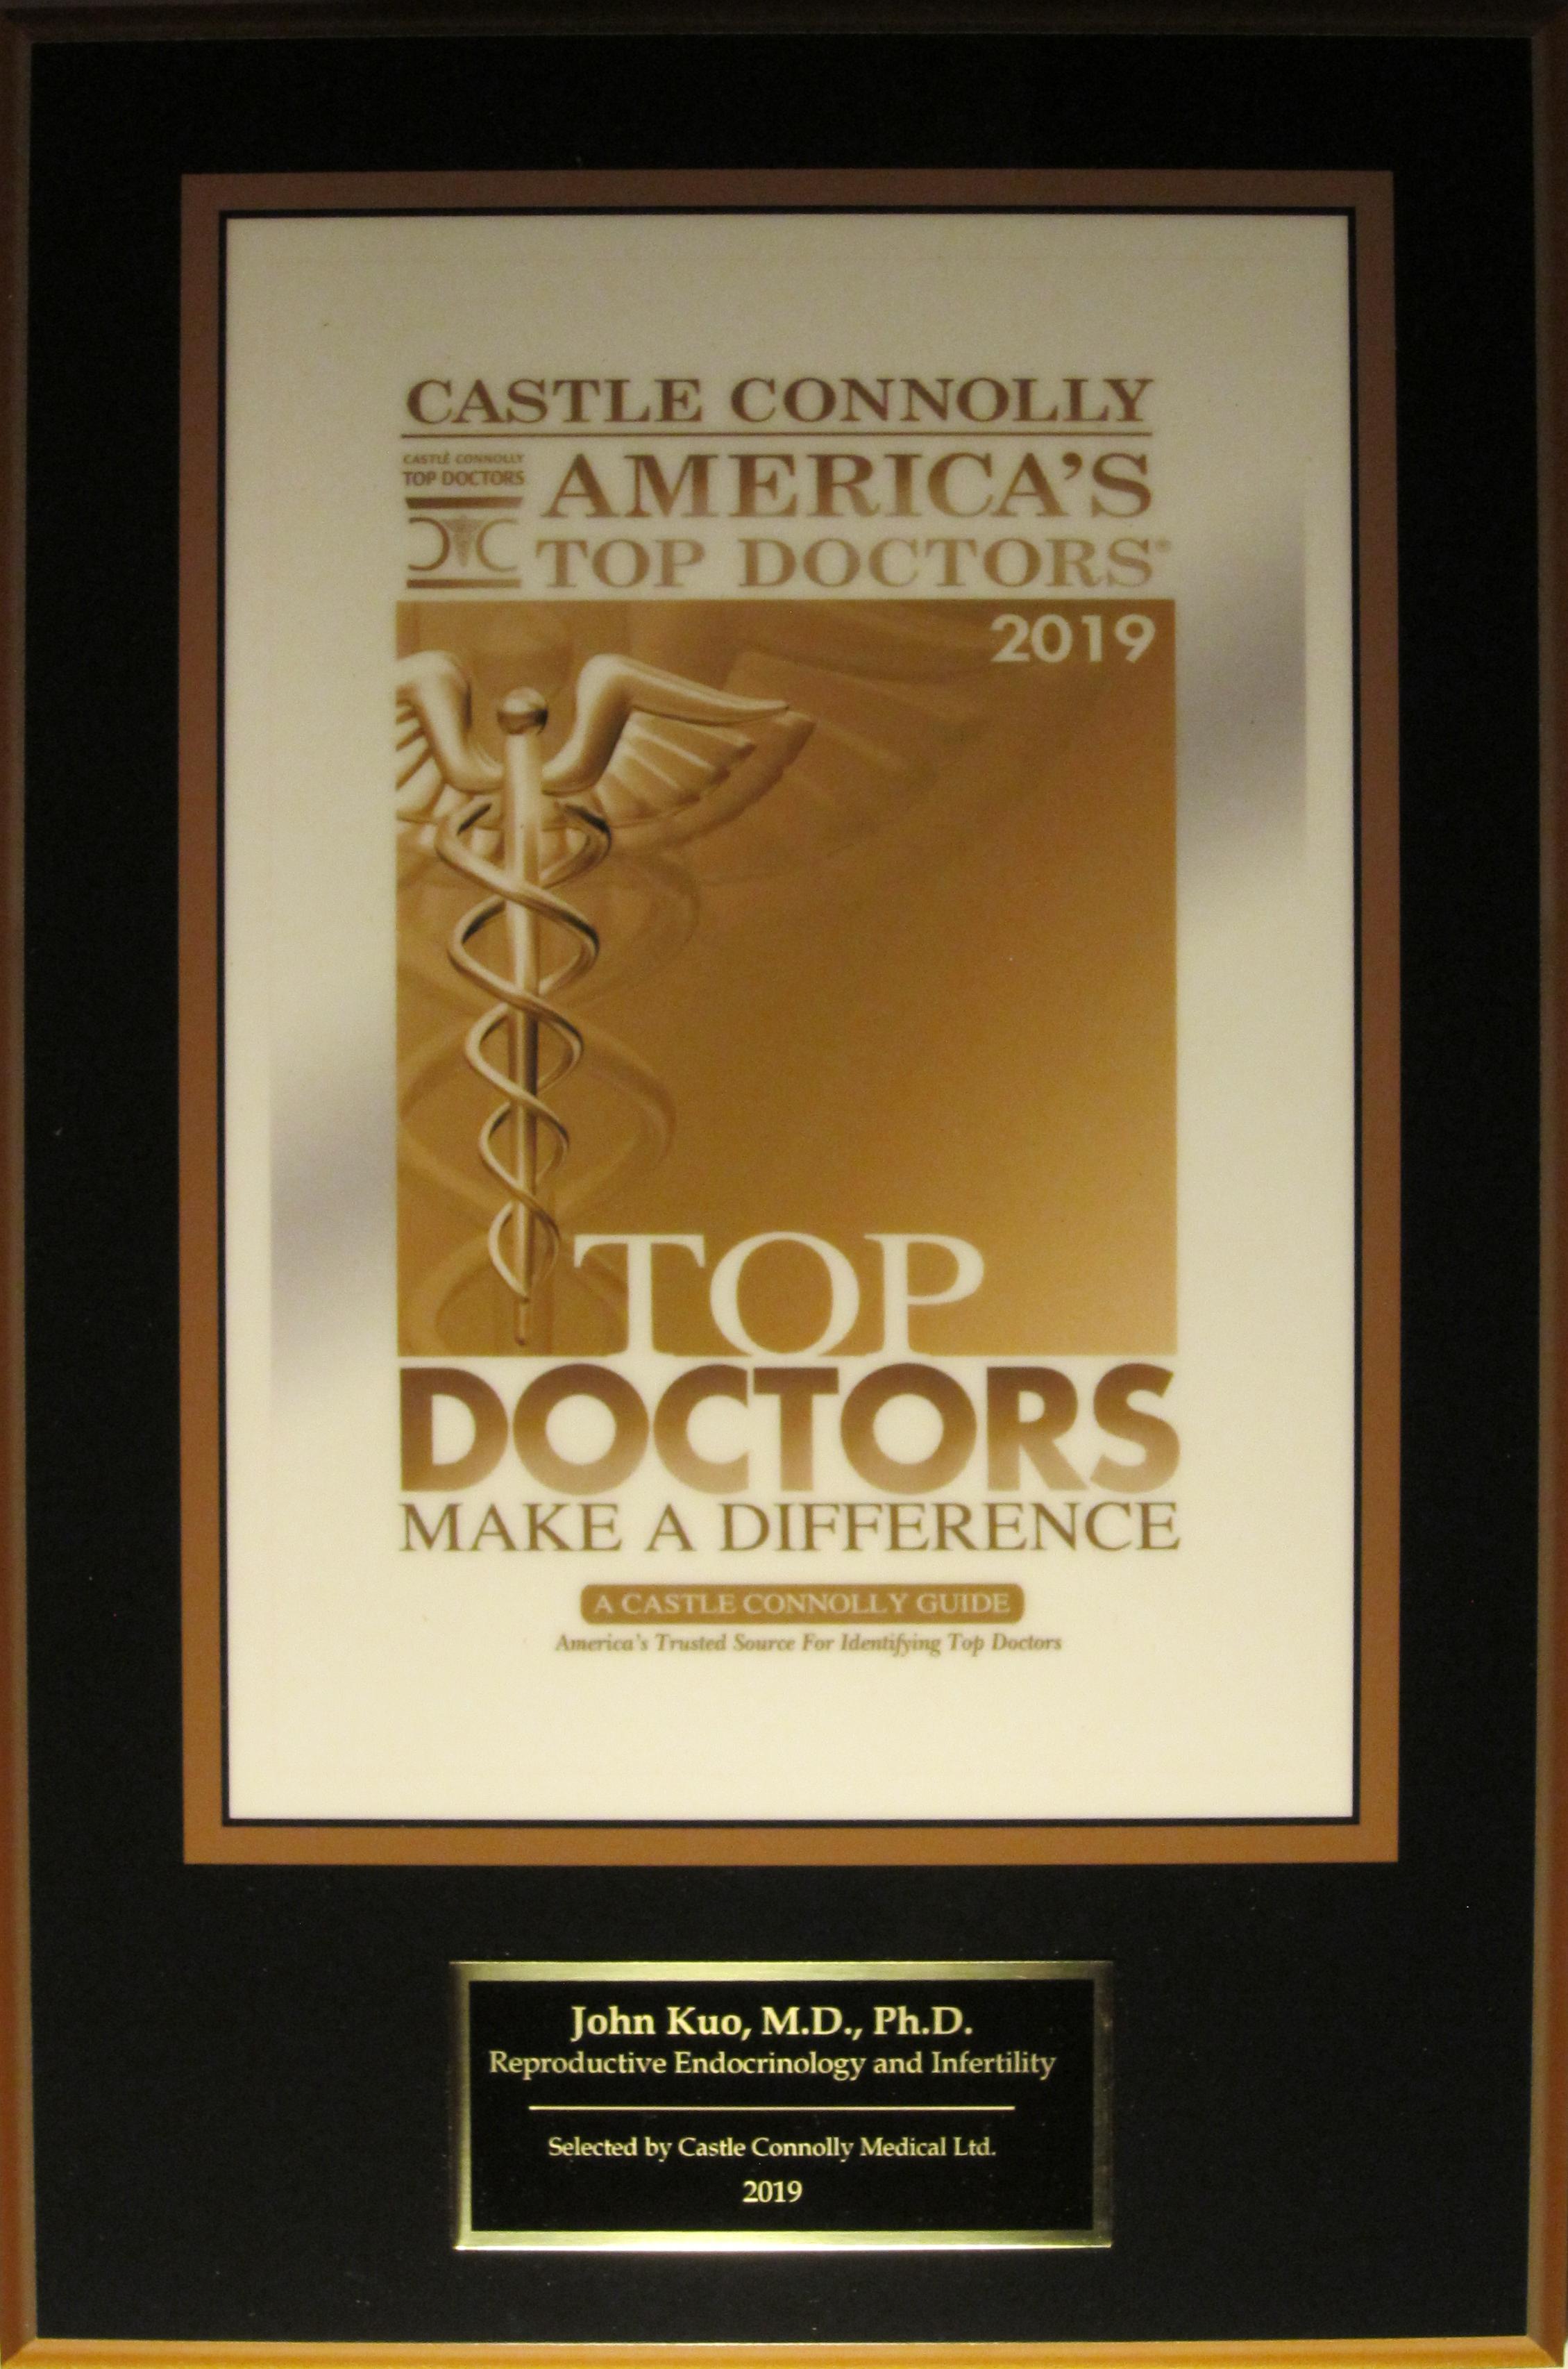 Outstanding Physician Awards | IVF Fertility Center Beverly